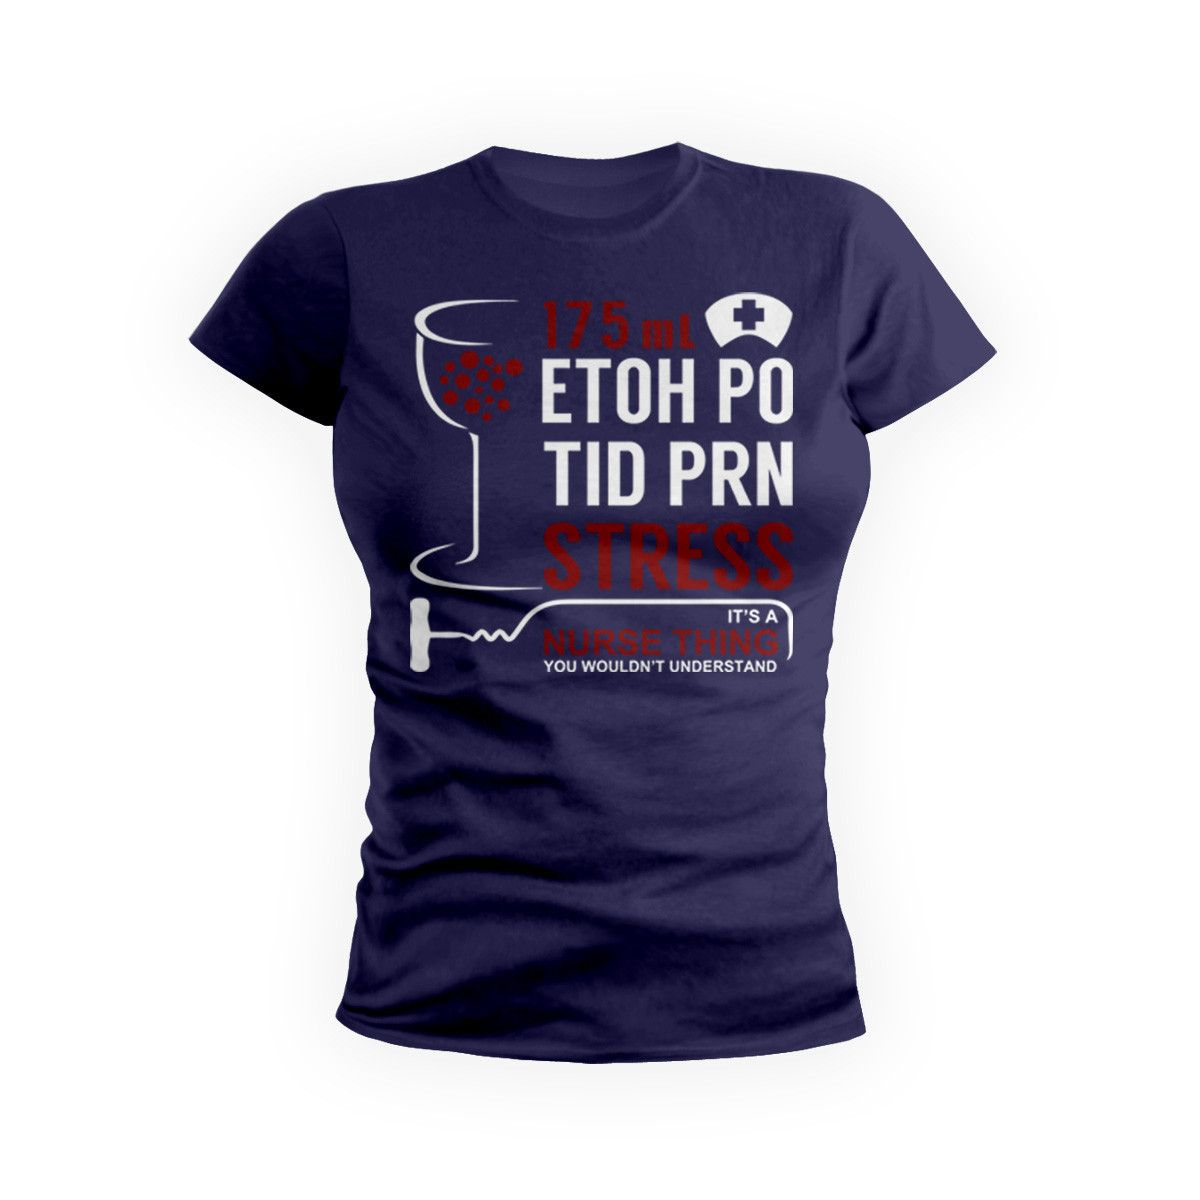 Medicinal Wine Shirts, T shirt, Online nursing schools